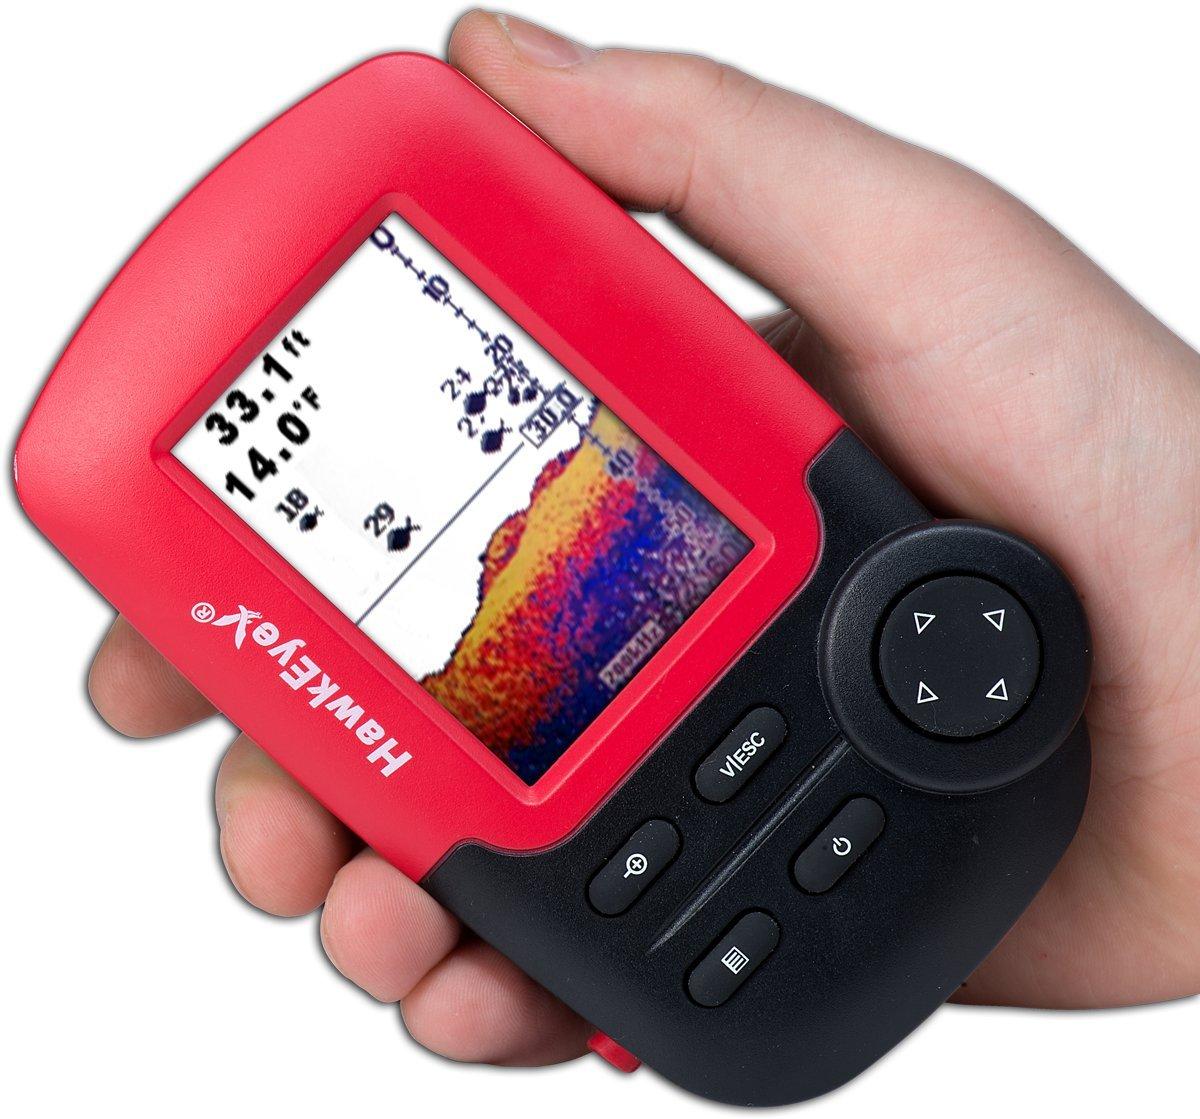 Amazon.com: HawkEye Fishtrax 1C Fish Finder with HD Color Virtuview ...